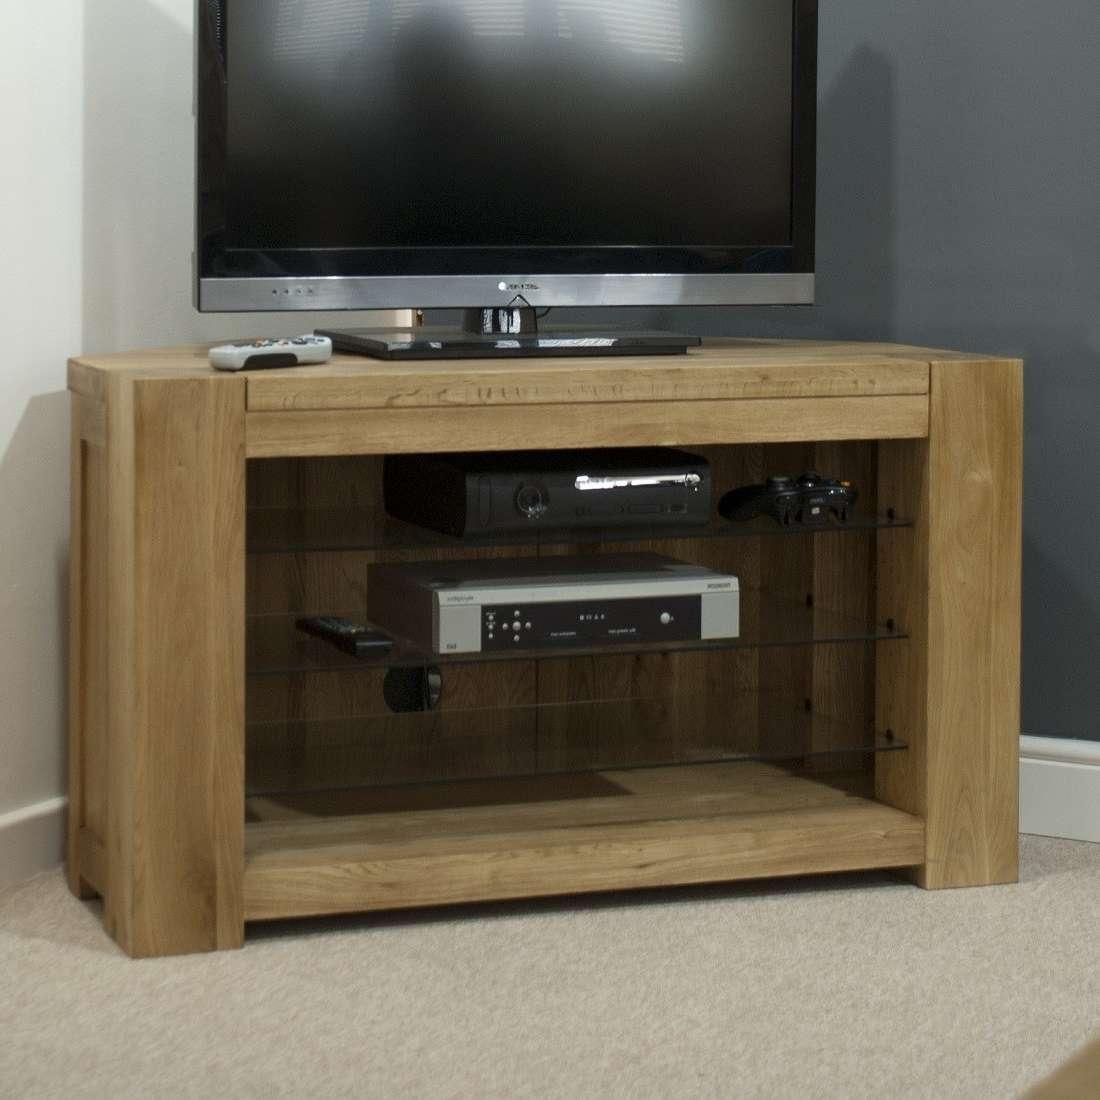 Trend Solid Oak Corner Tv Unit | Oak Furniture Uk With Dark Wood Corner Tv Cabinets (View 15 of 20)